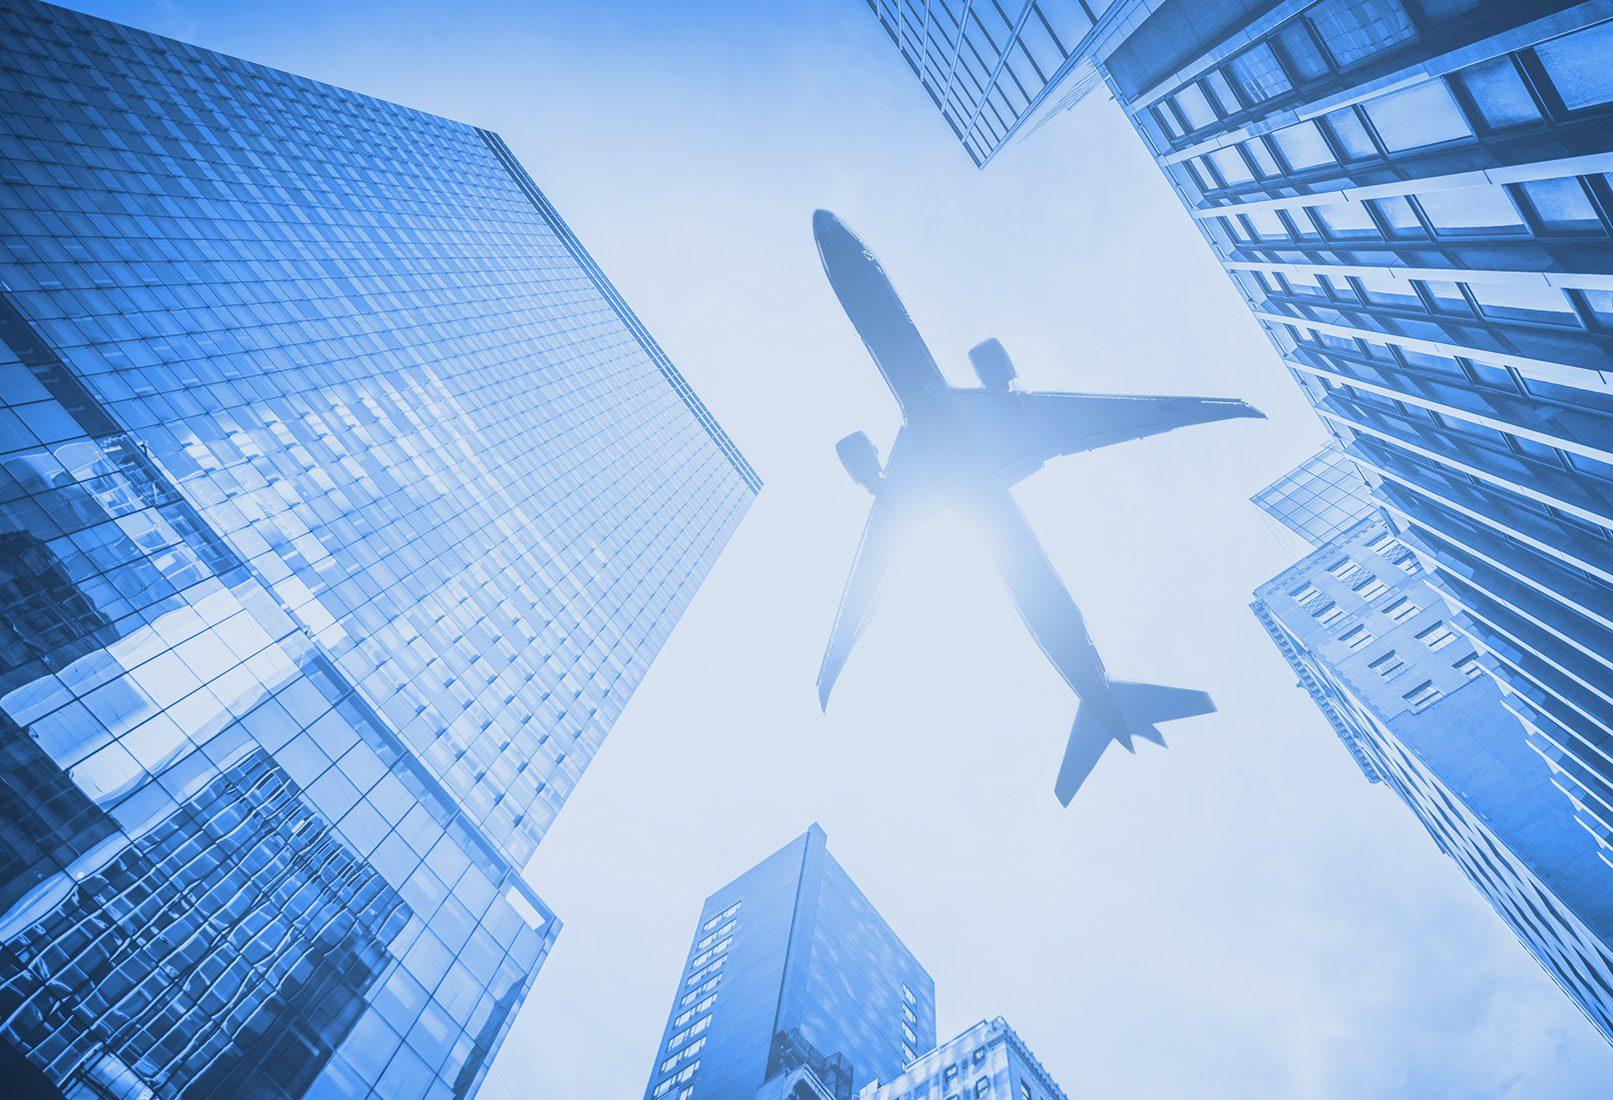 Falko Regional Aircraft Limited announces inaugural ABS transaction